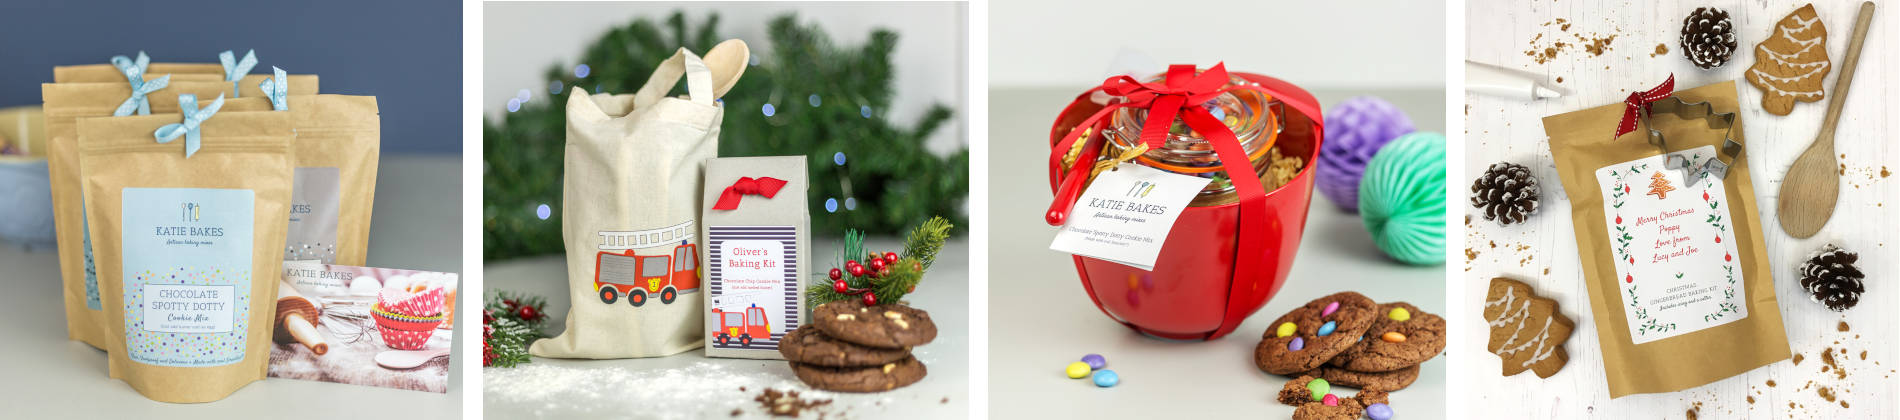 Katie Bakes Baking Gifts Christmas 2019